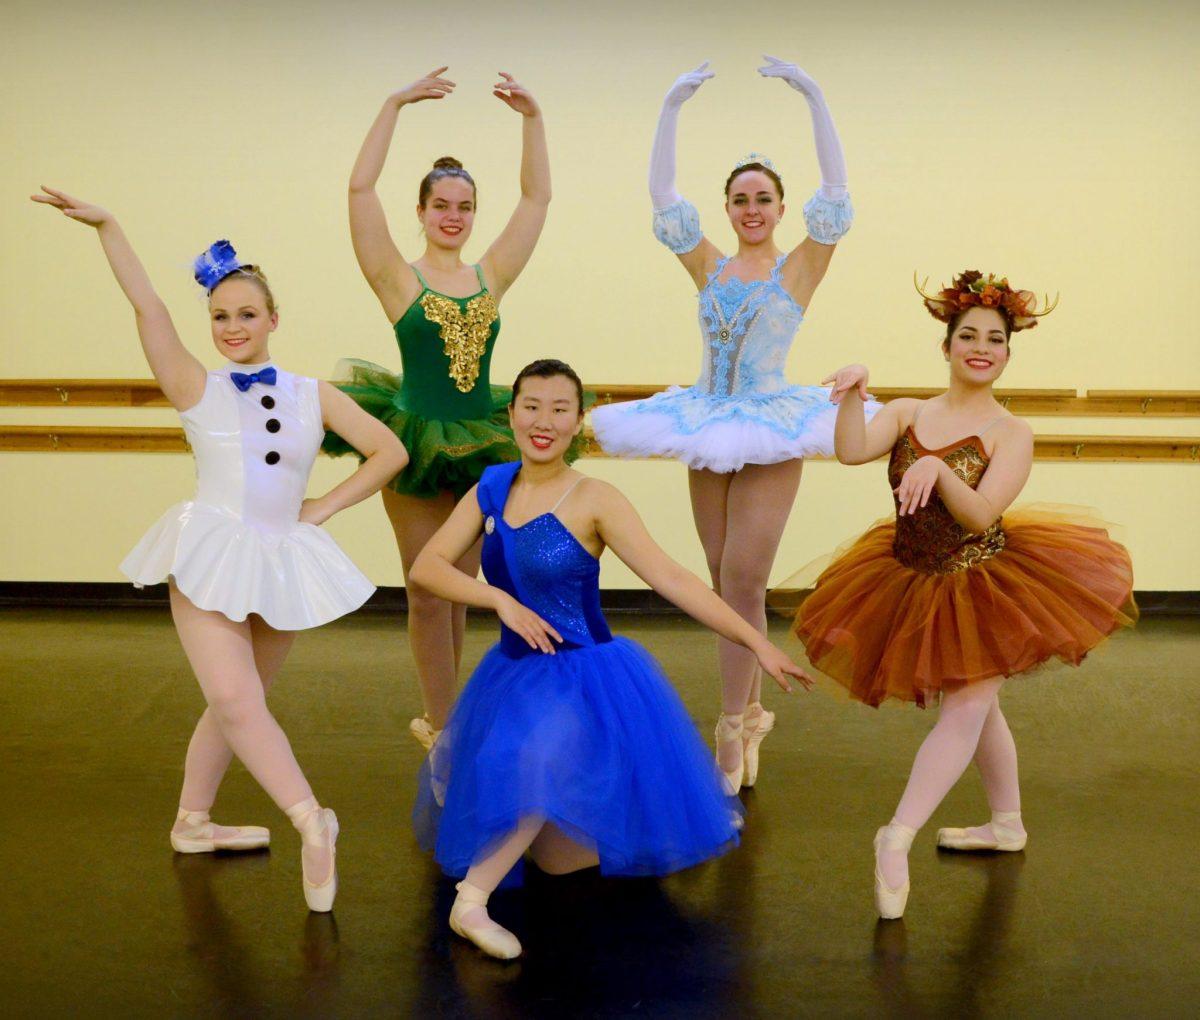 plano metropolitan ballet seniors frozen kingdom elza e1450110586363 1